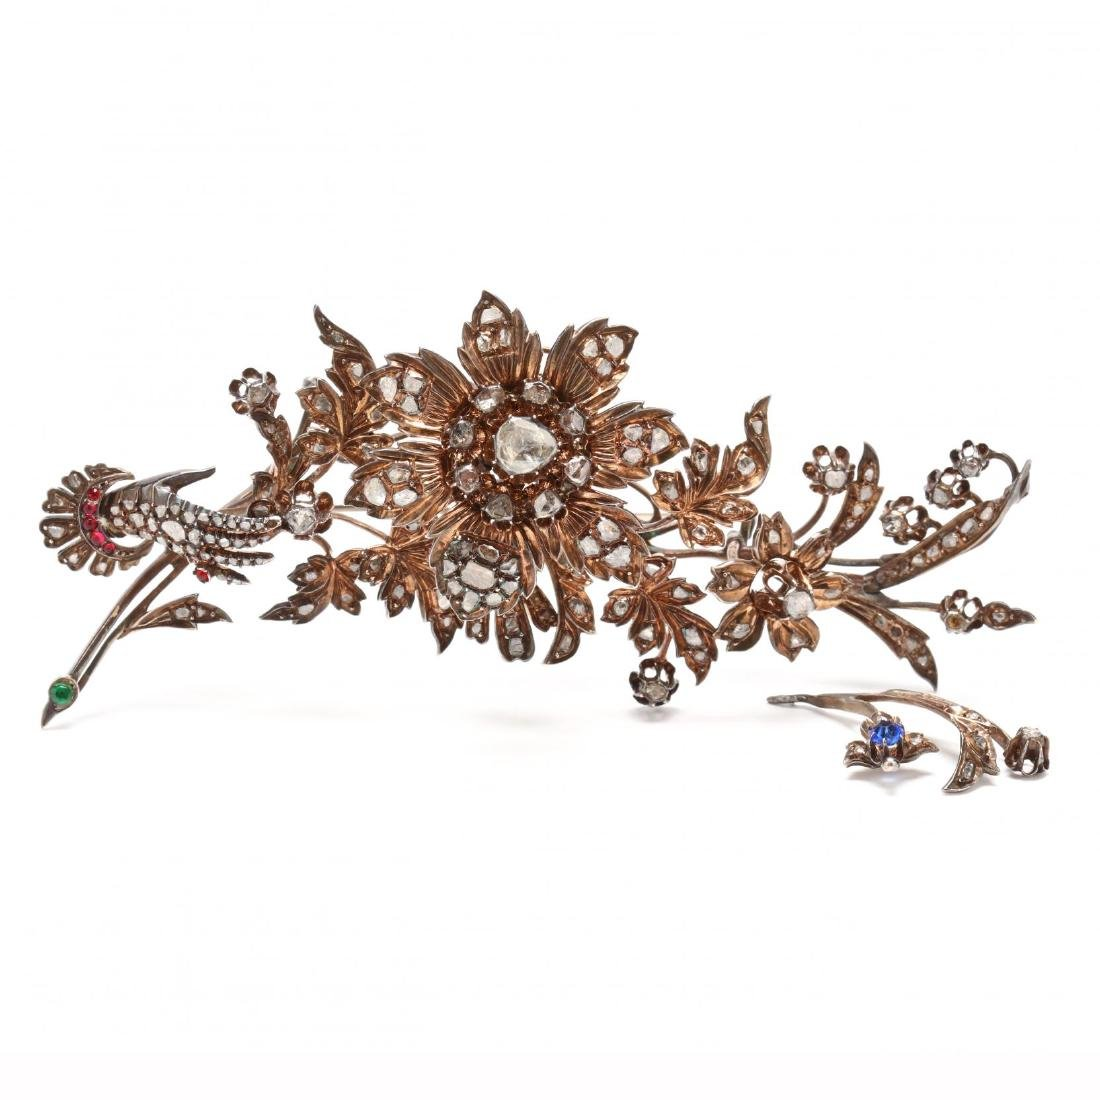 Antique Silver-Gilt and Diamond En Tremblant Brooch